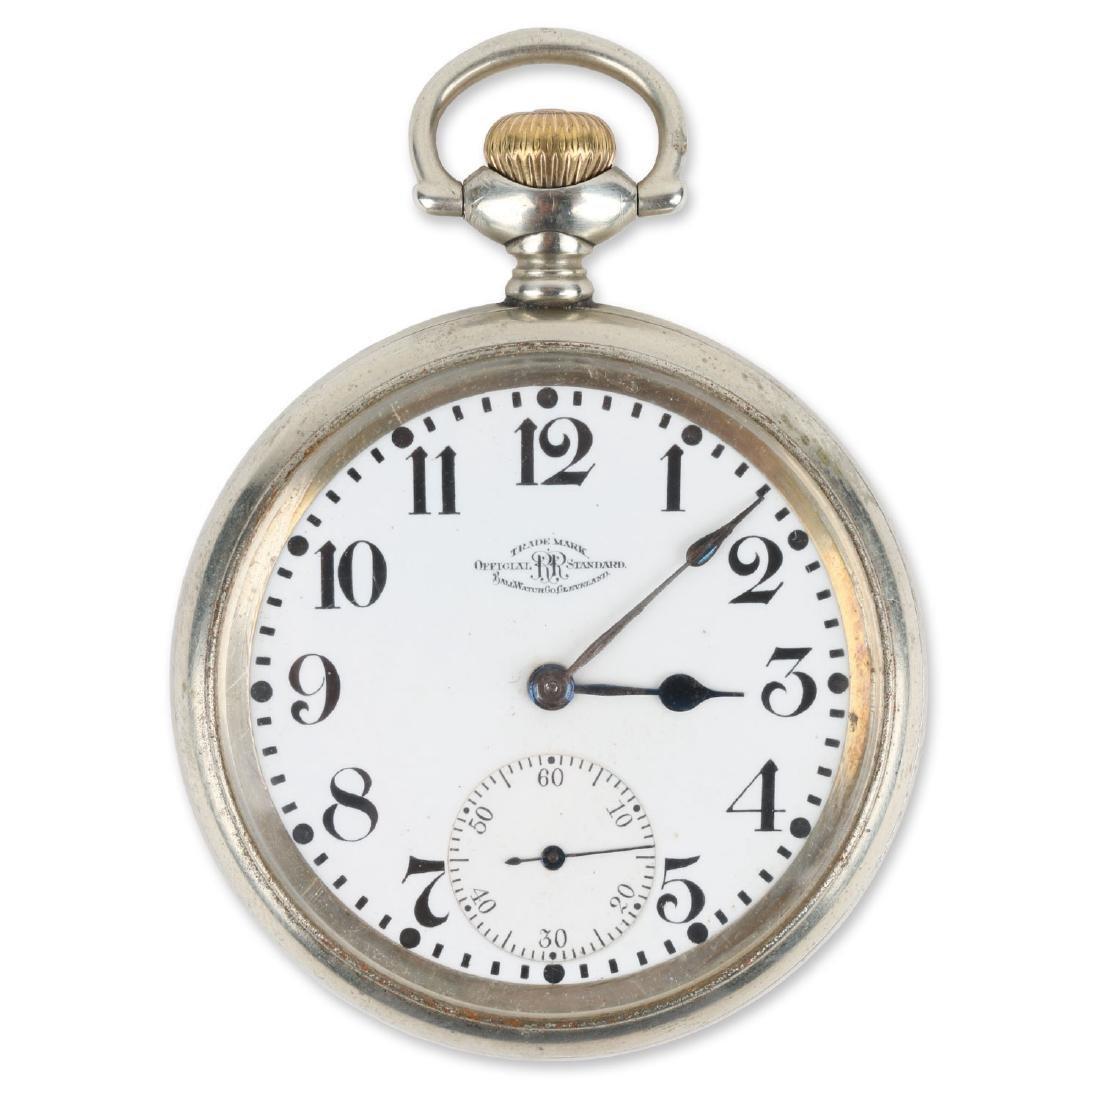 21J Ball Watch Co. 1899 Model Waltham Pocket Watch